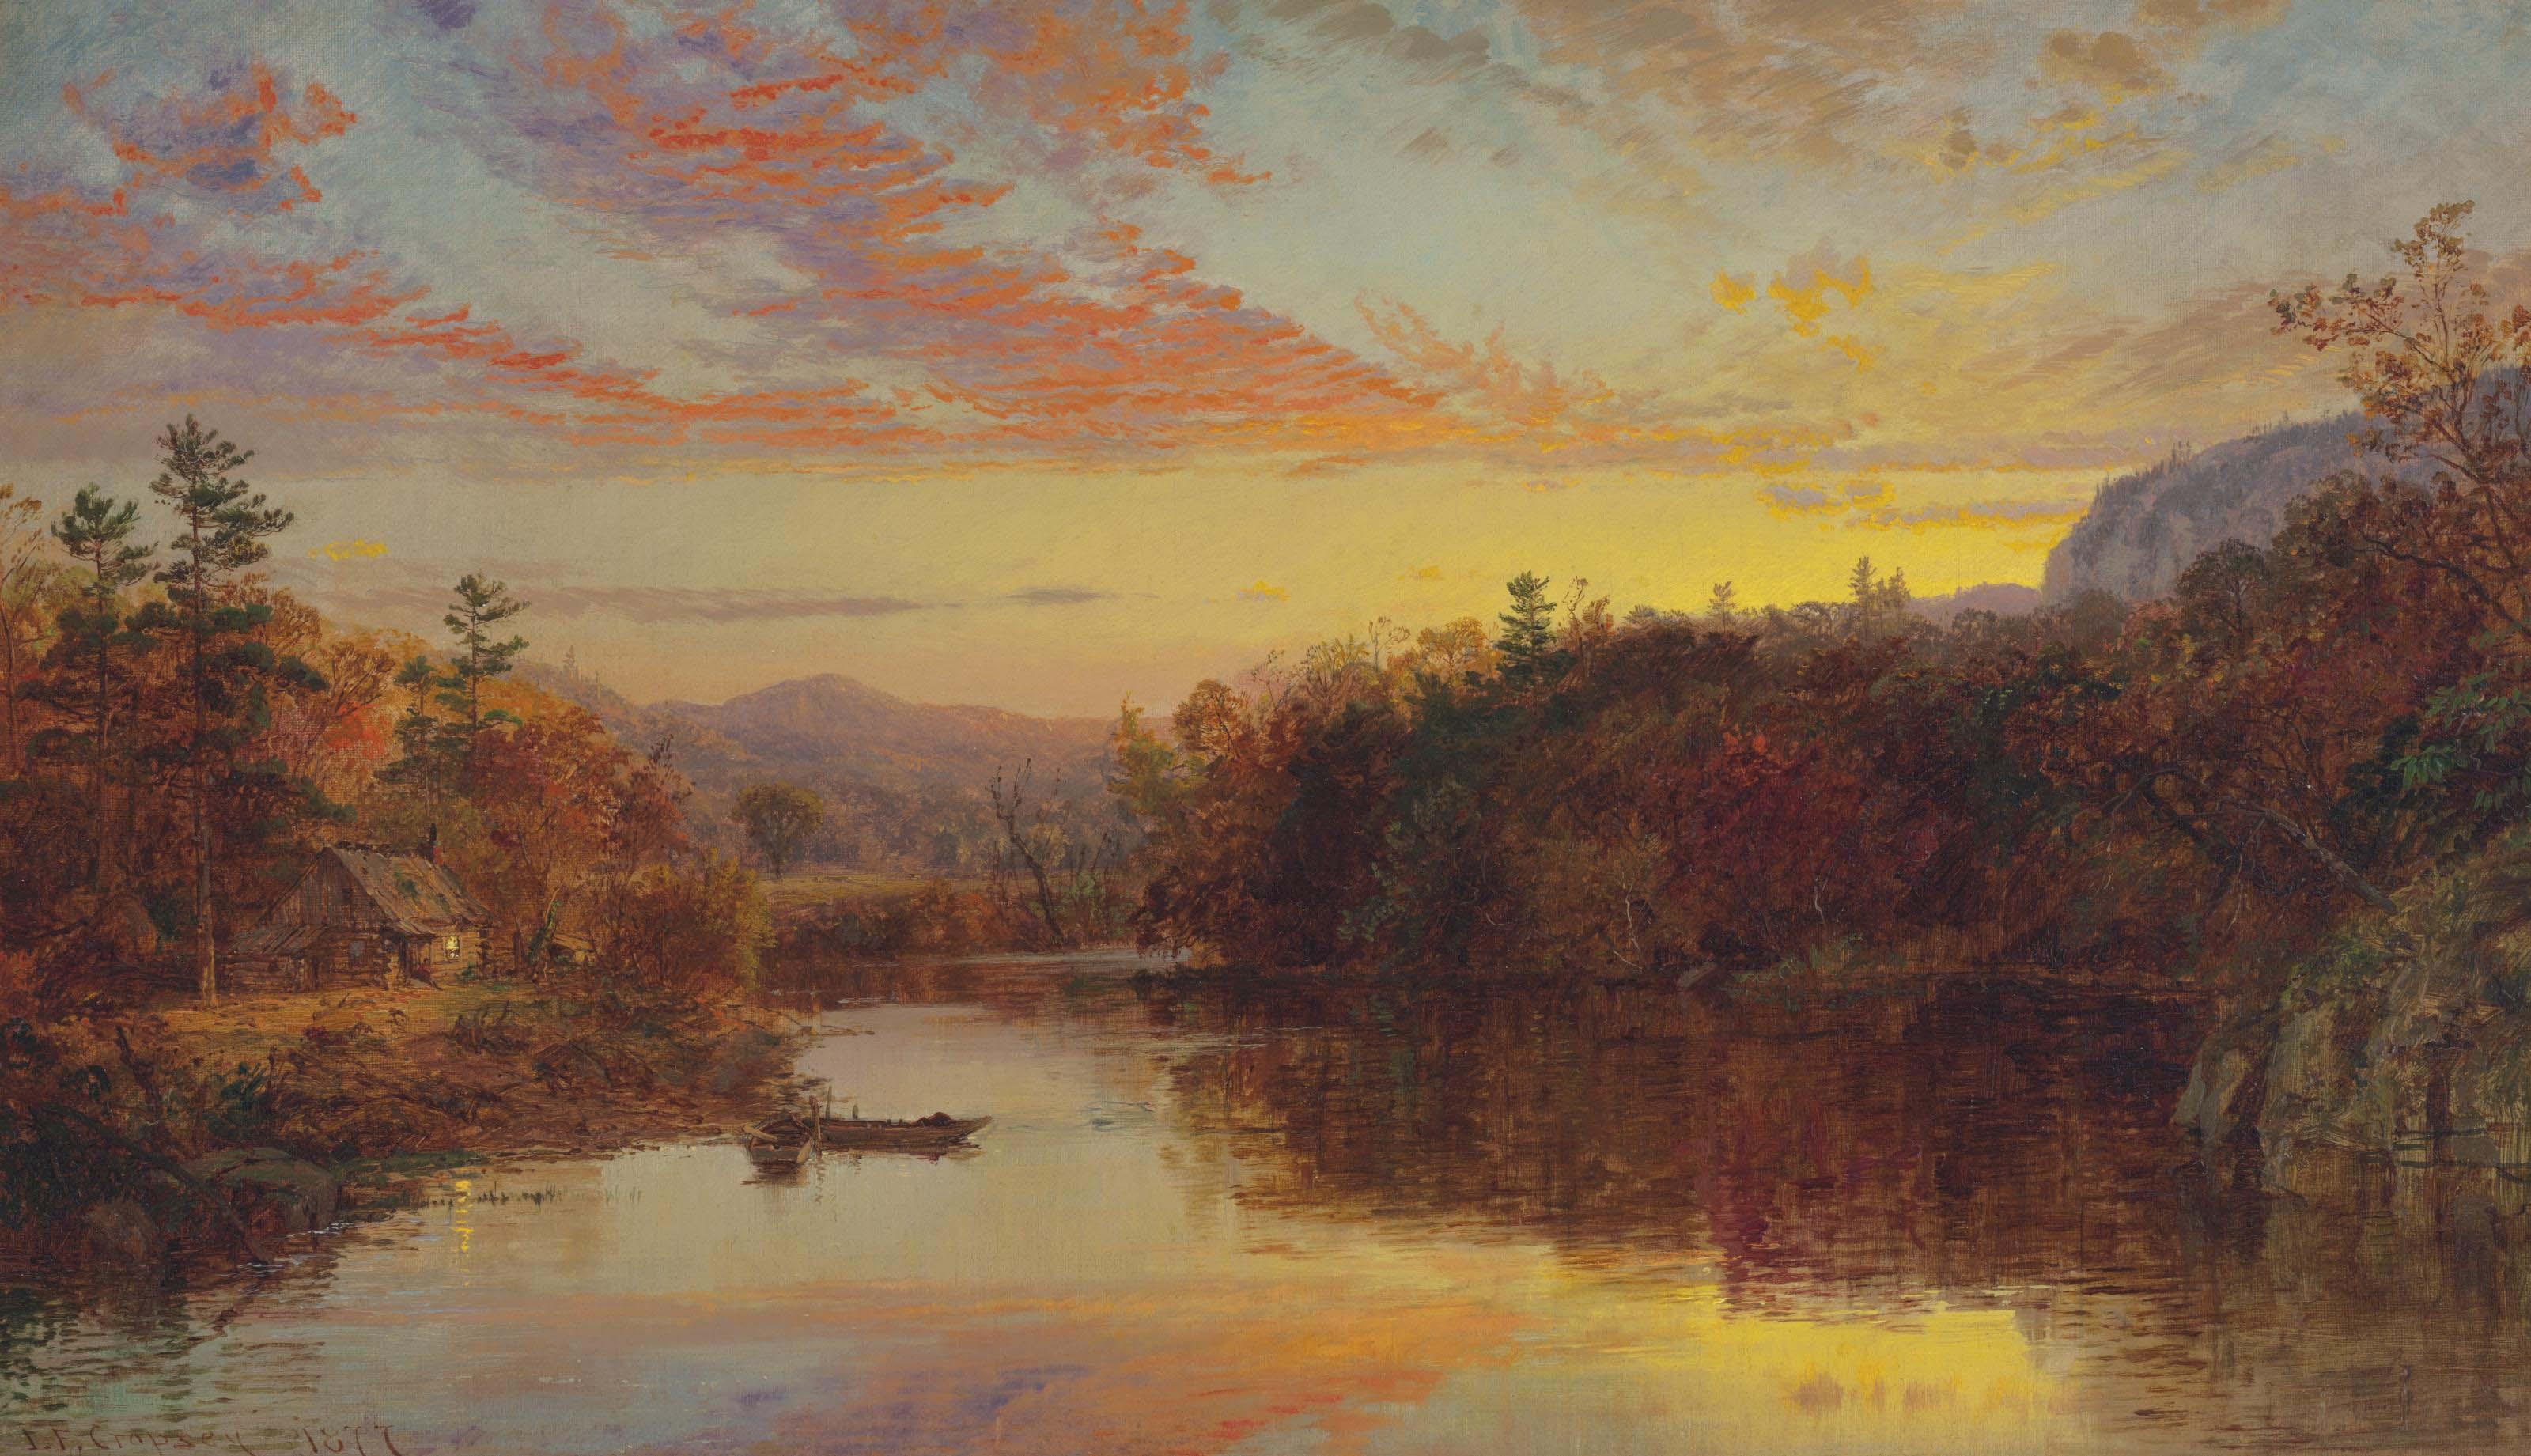 Sunset on Greenwood Lake